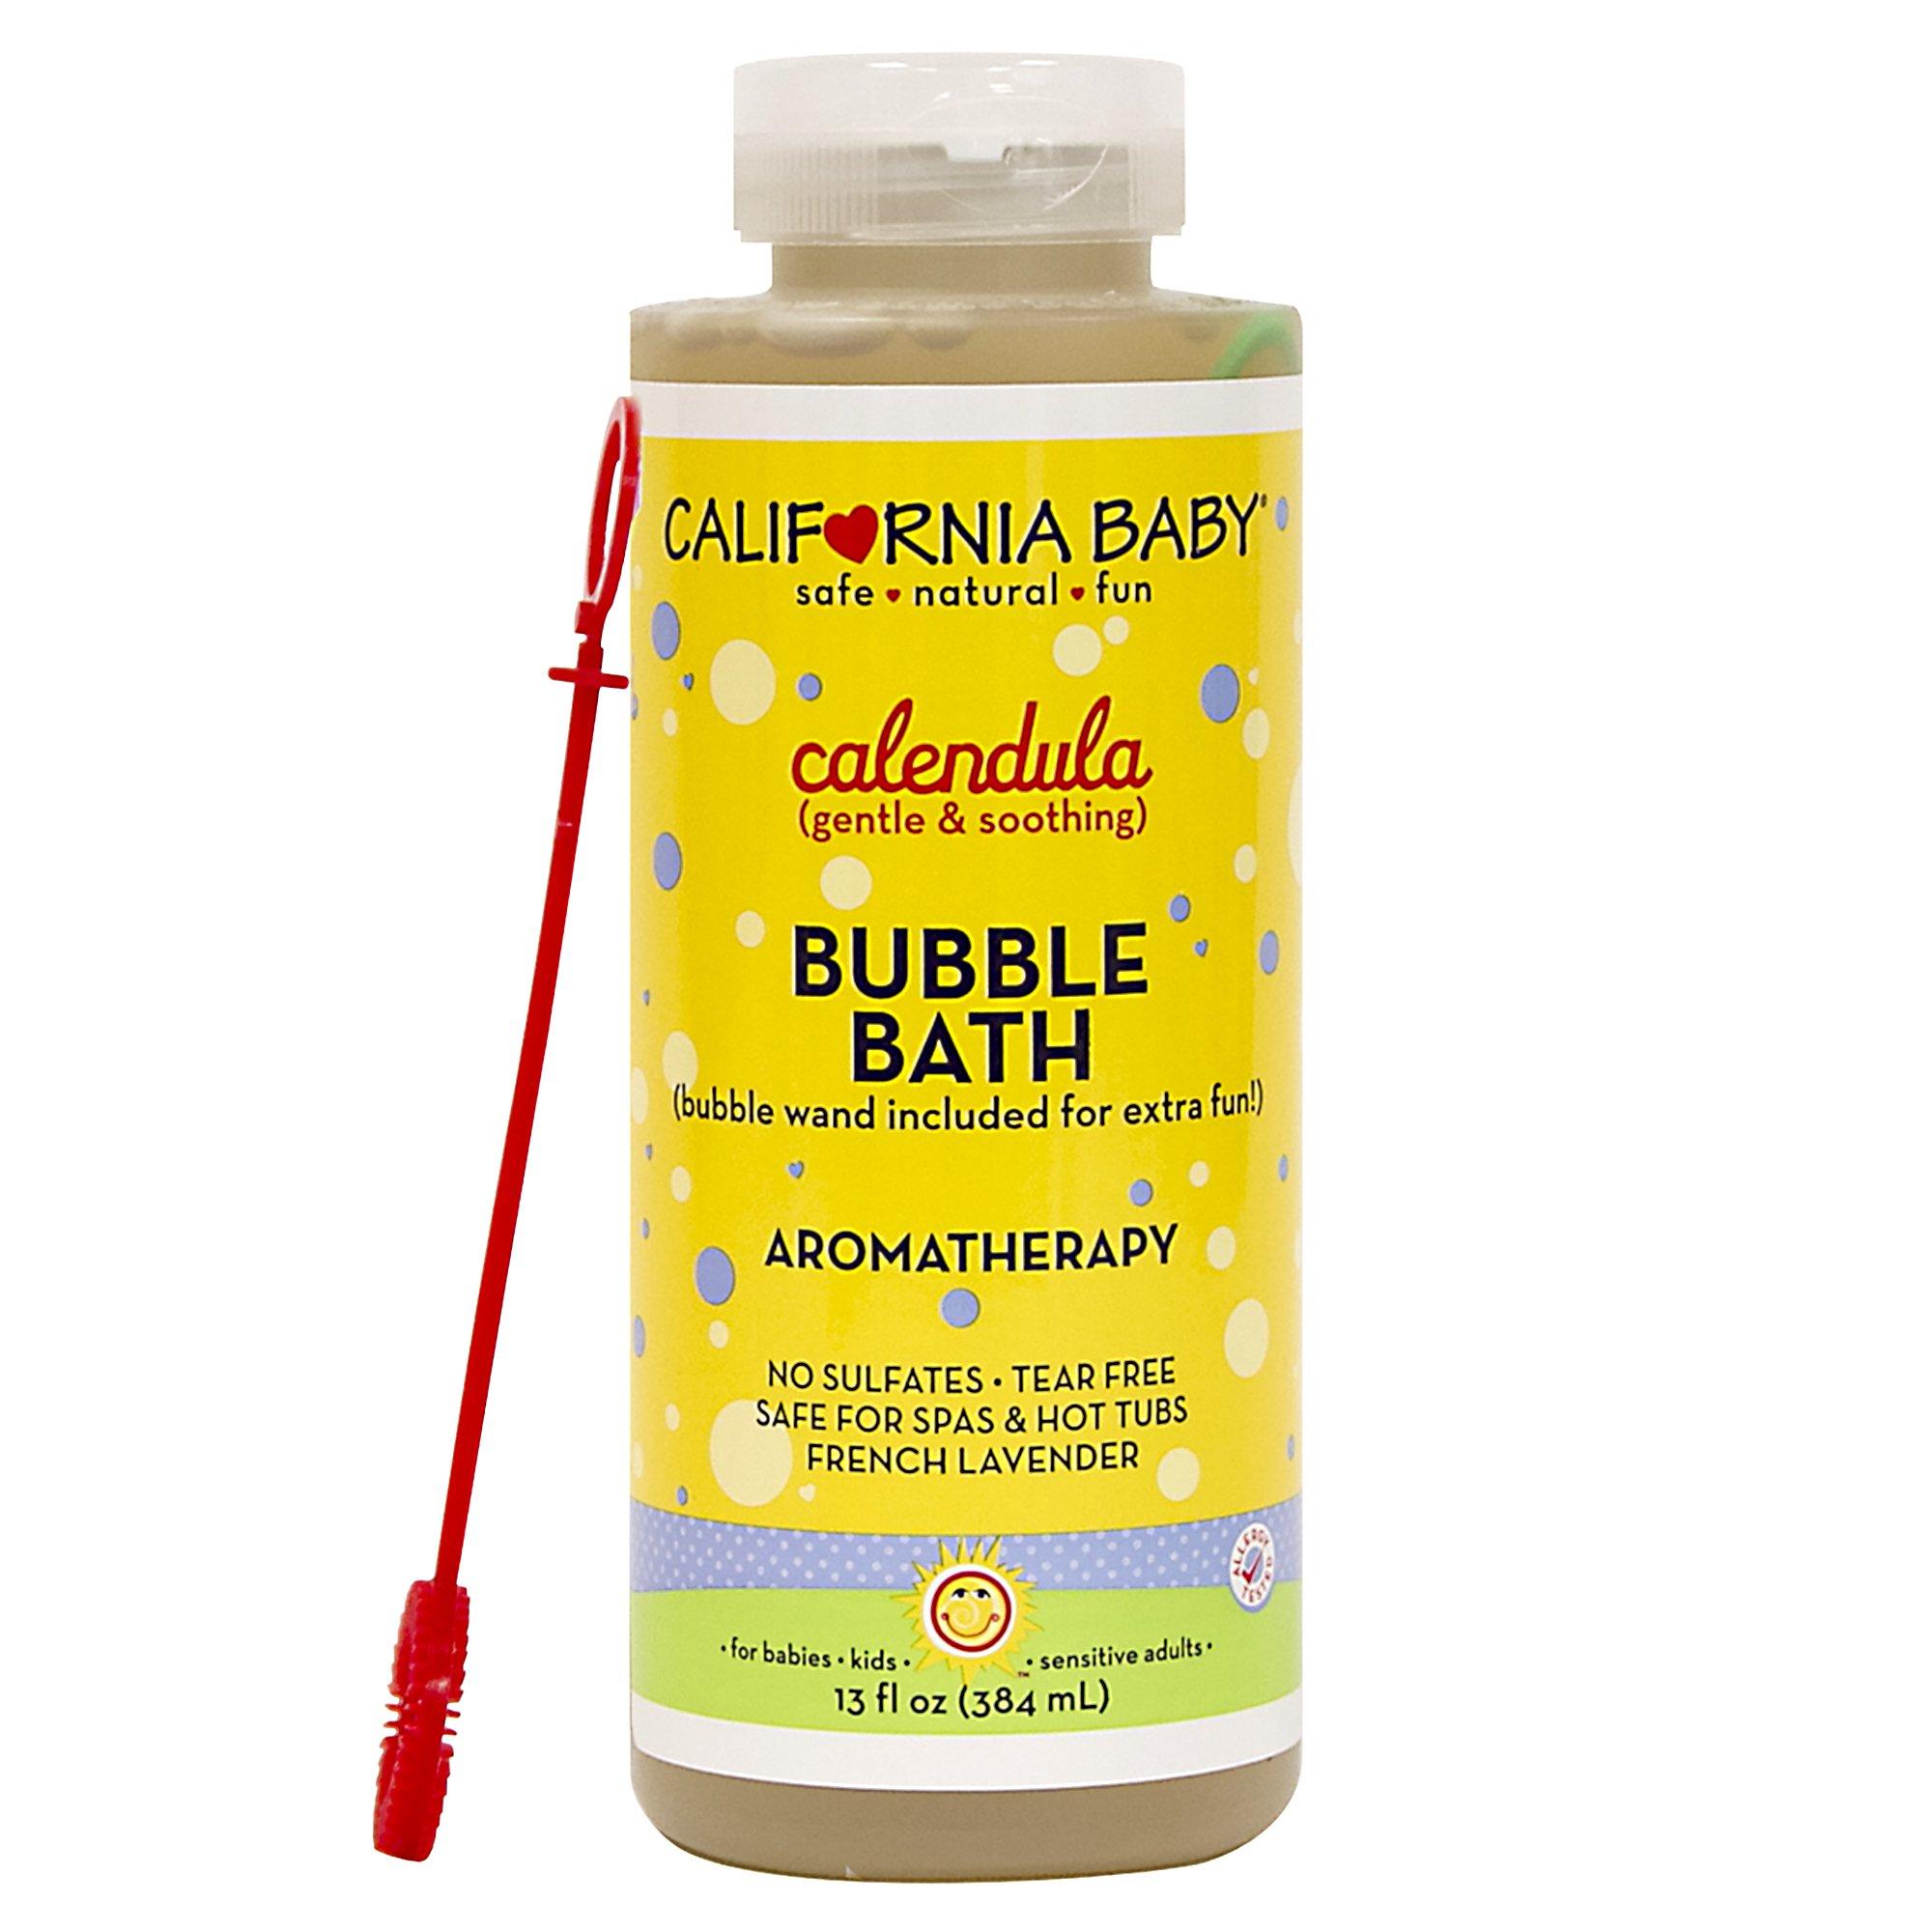 California Baby Calendula Bubble Bath | No Tear | Pure Essential Oils for Bathing | Hot Tubs, or Spa Use | Moisturizing Organic Aloe Vera and Calendula Extract |(13 fl. ounces) by California Baby